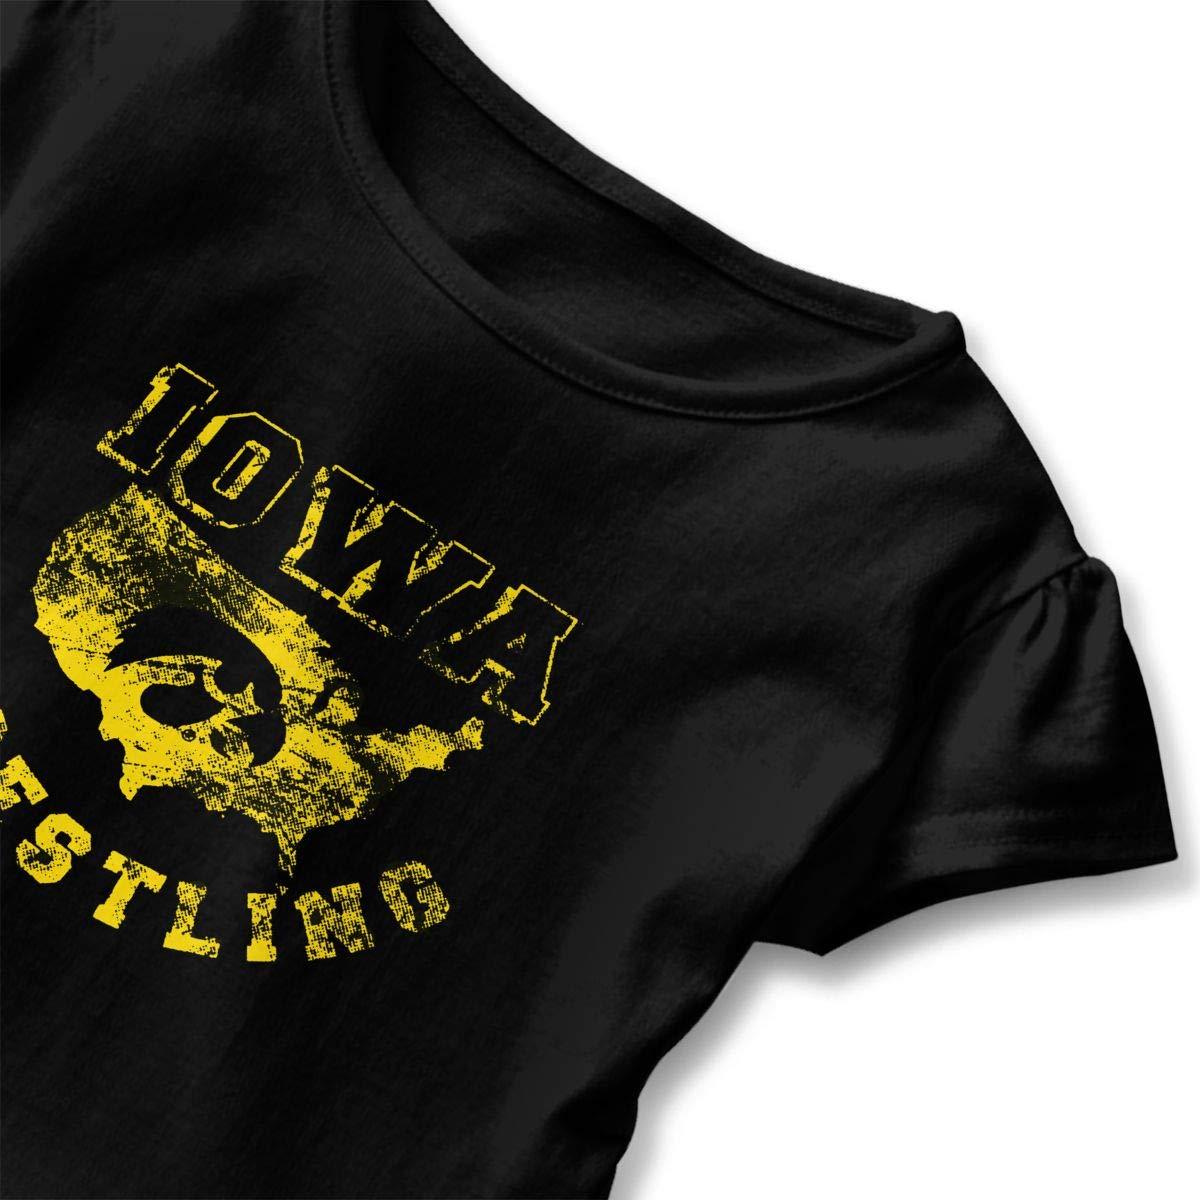 ZP-CCYF Iowa USA Wrestling Toddler Baby Girl Ruffle Short Sleeve T-Shirt Cute Cotton T Shirts